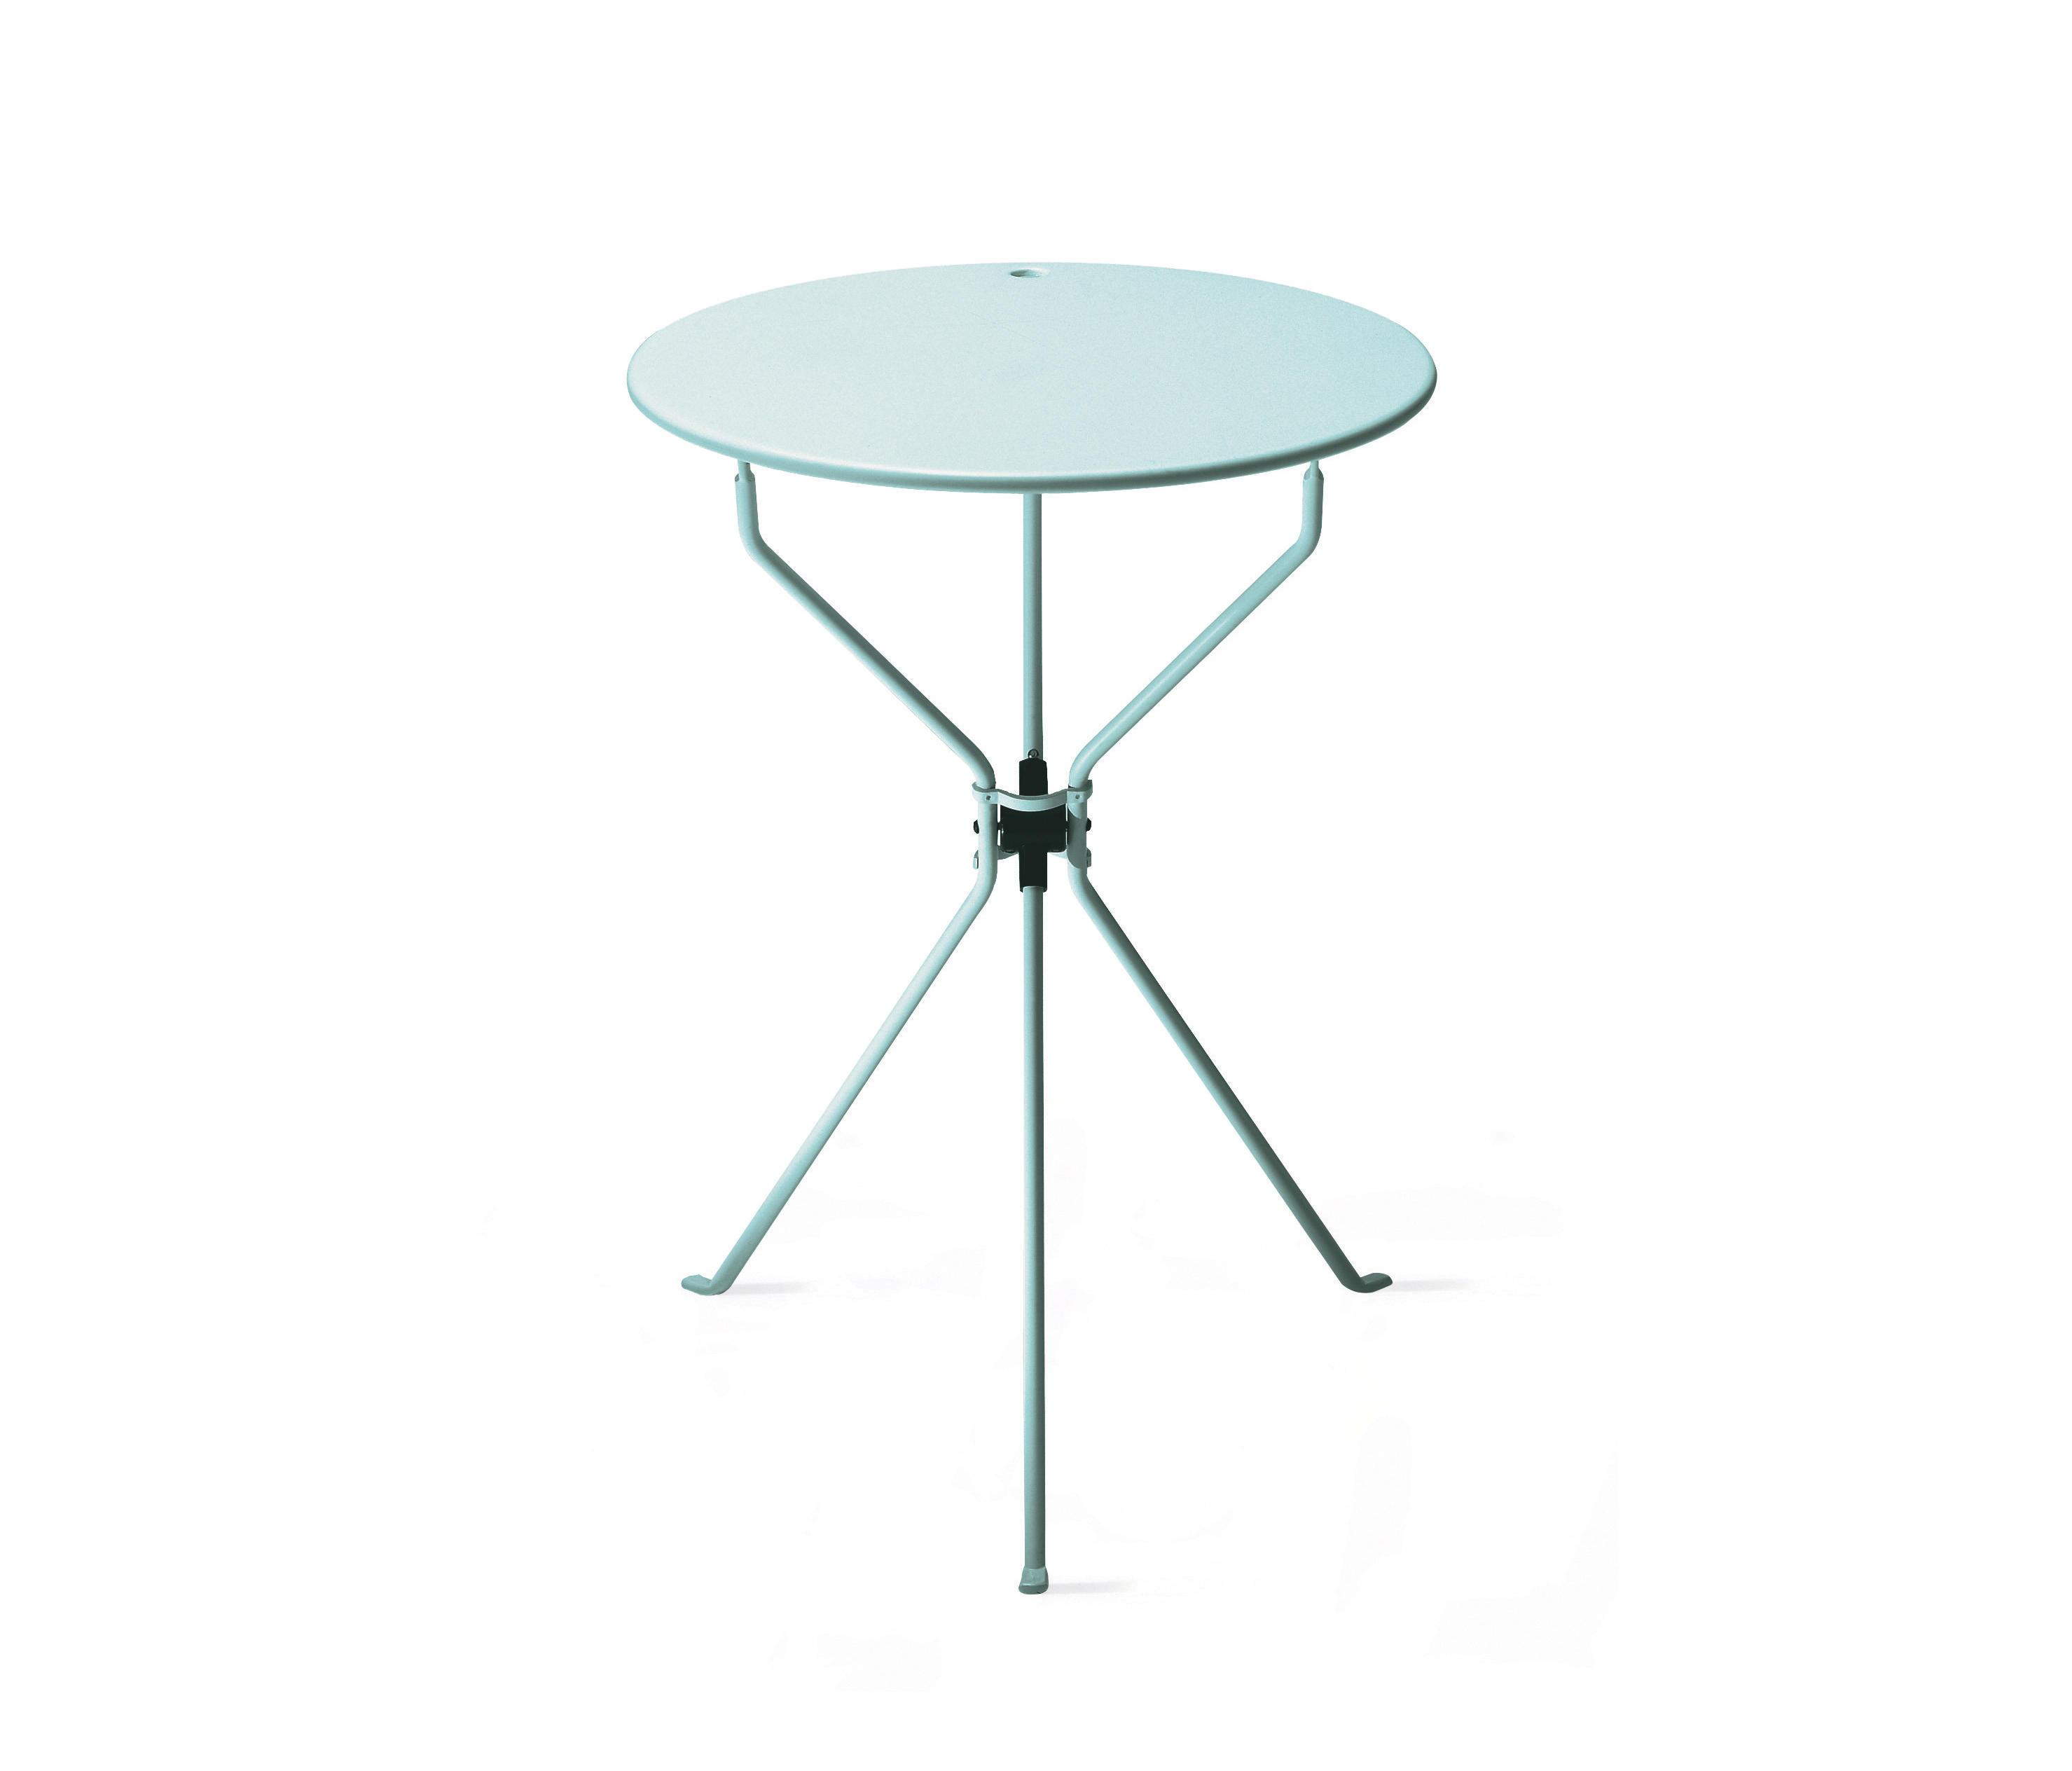 Cumano 630 side tables from zanotta architonic cumano 630 by zanotta side tables keyboard keysfo Image collections